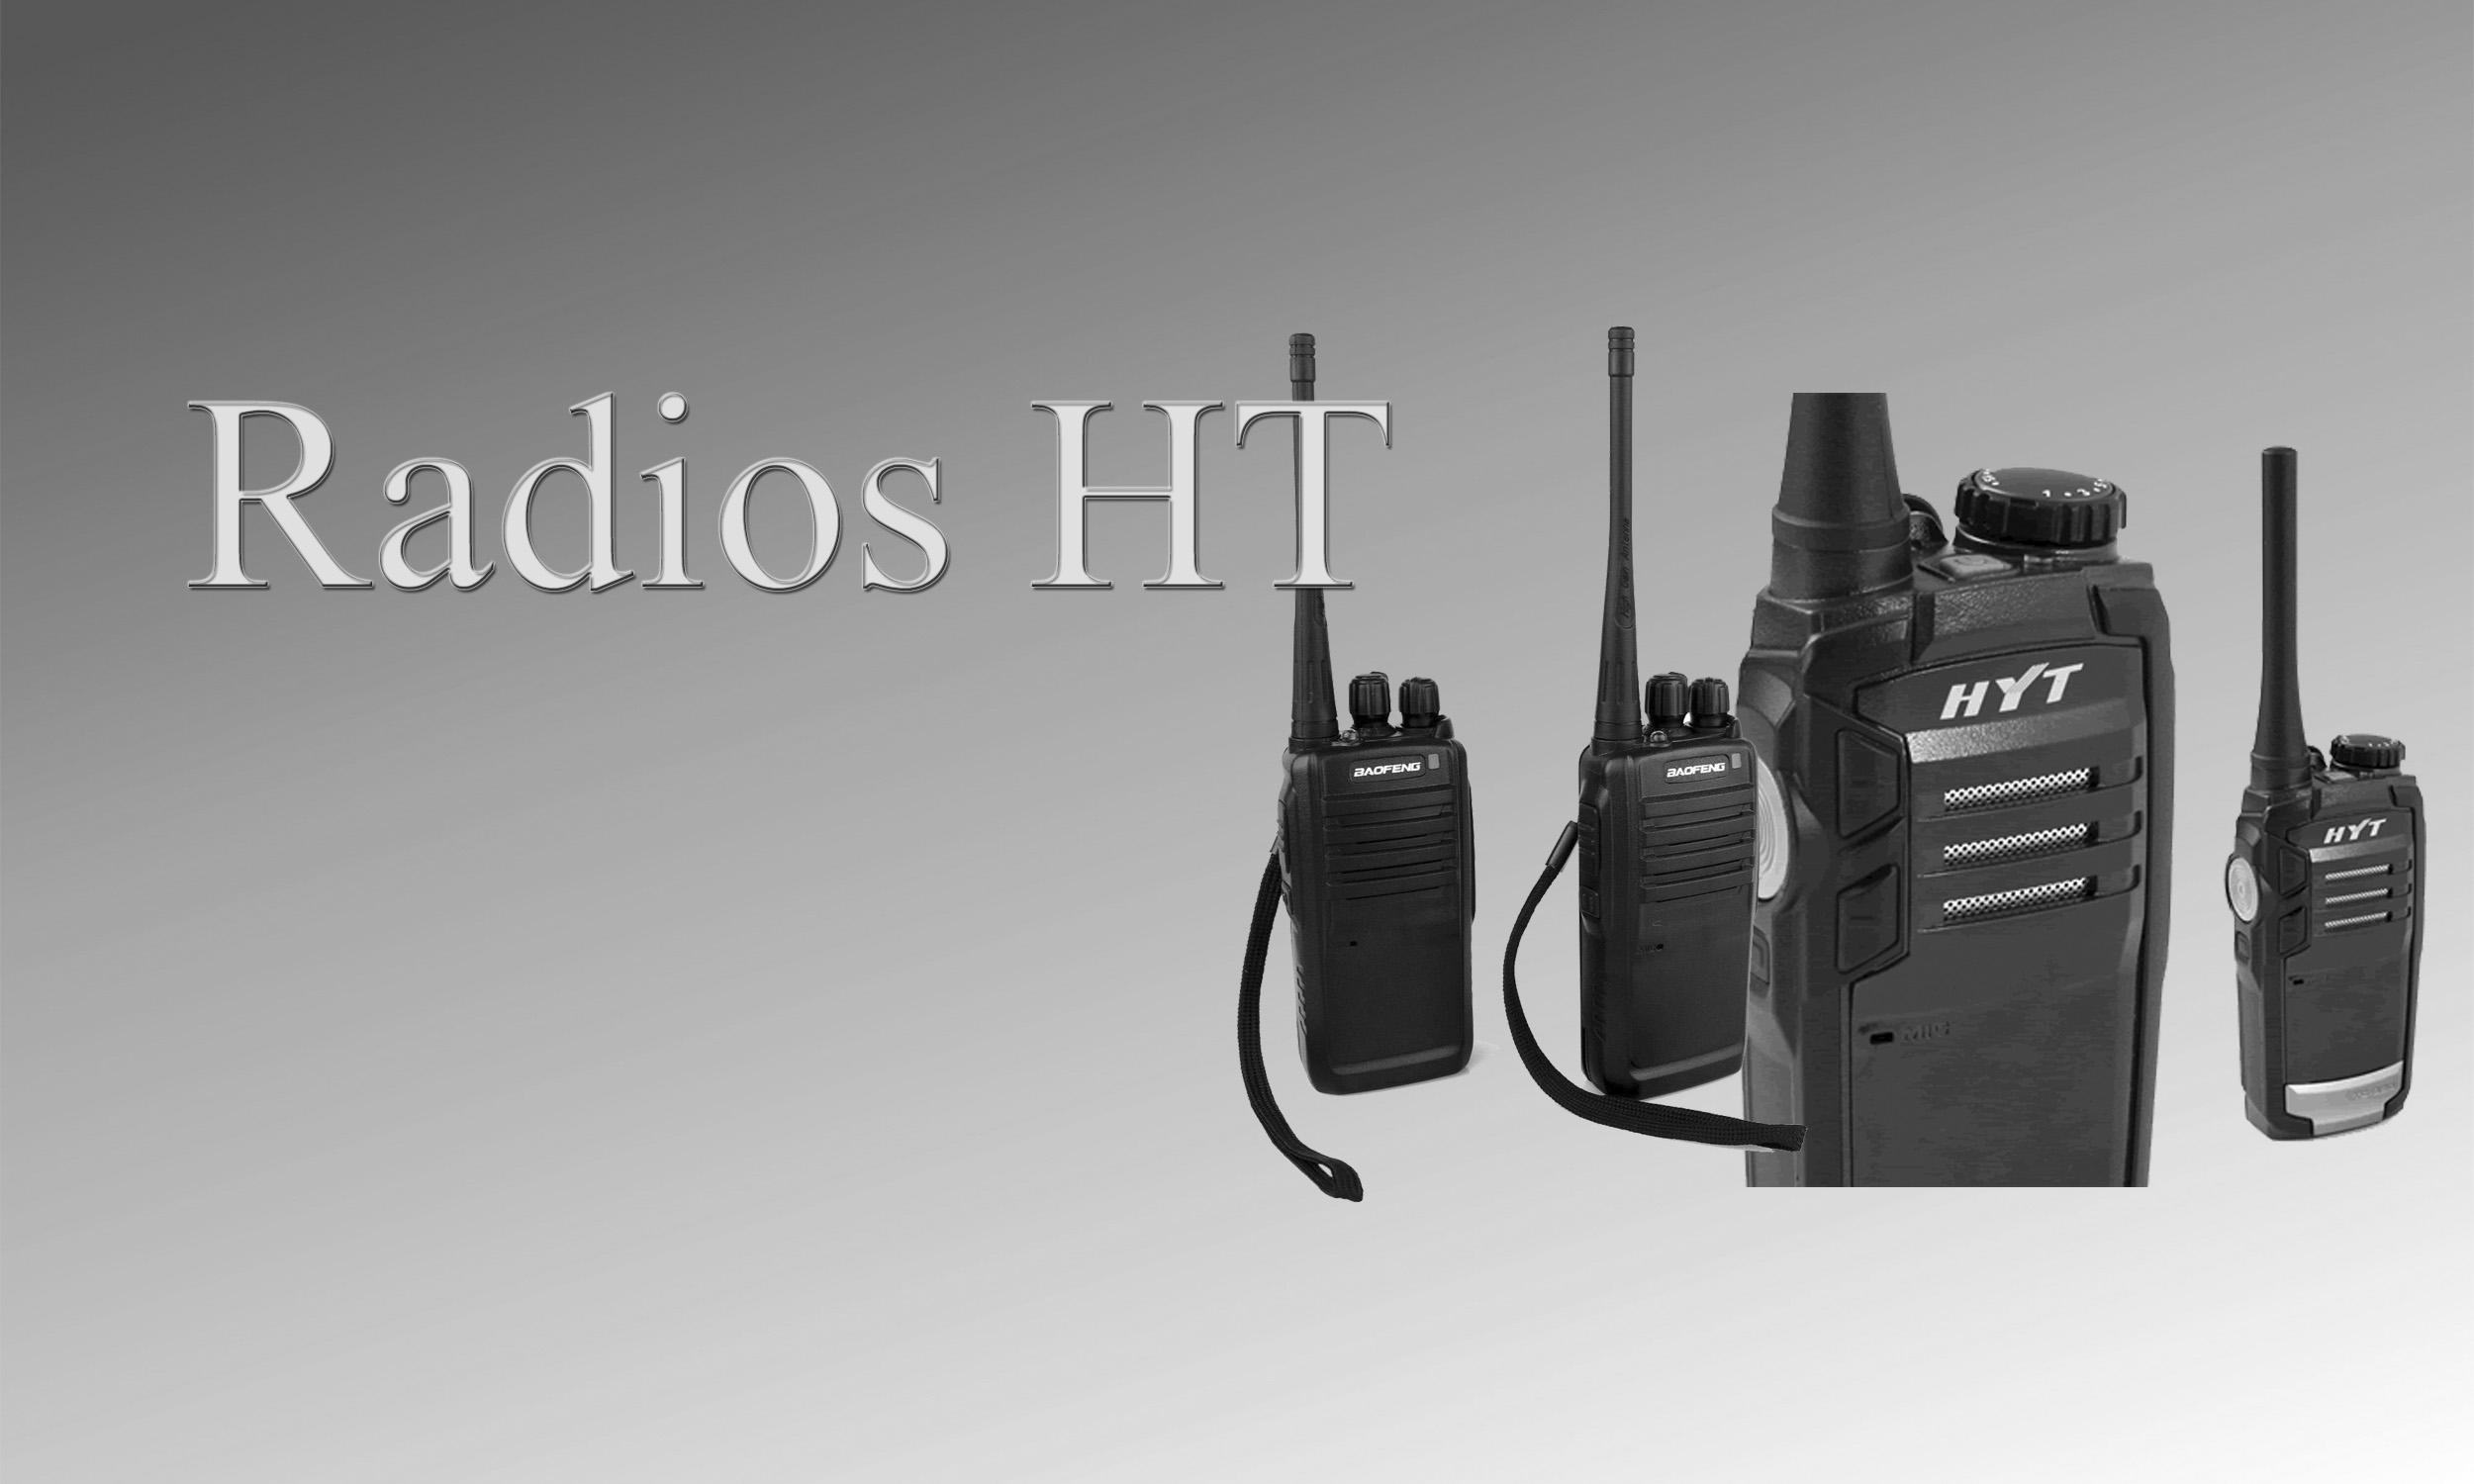 Radios HT